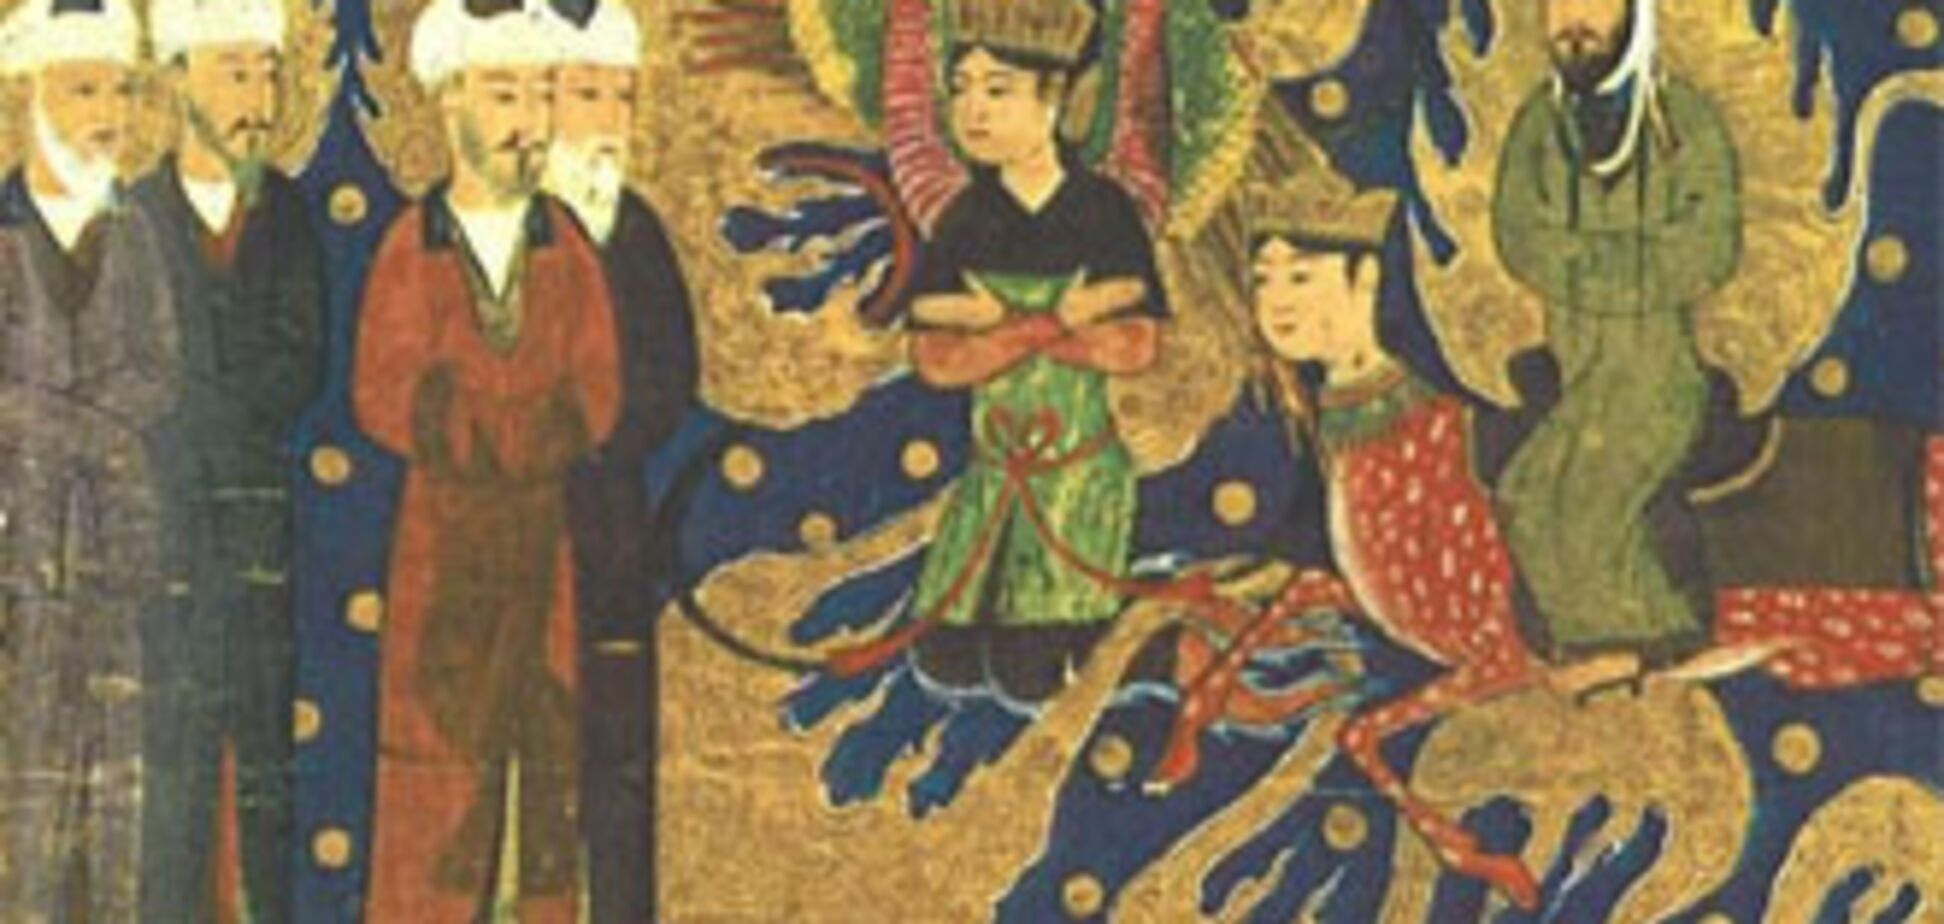 Художника намагалися вбити за карикатуру на Пророка